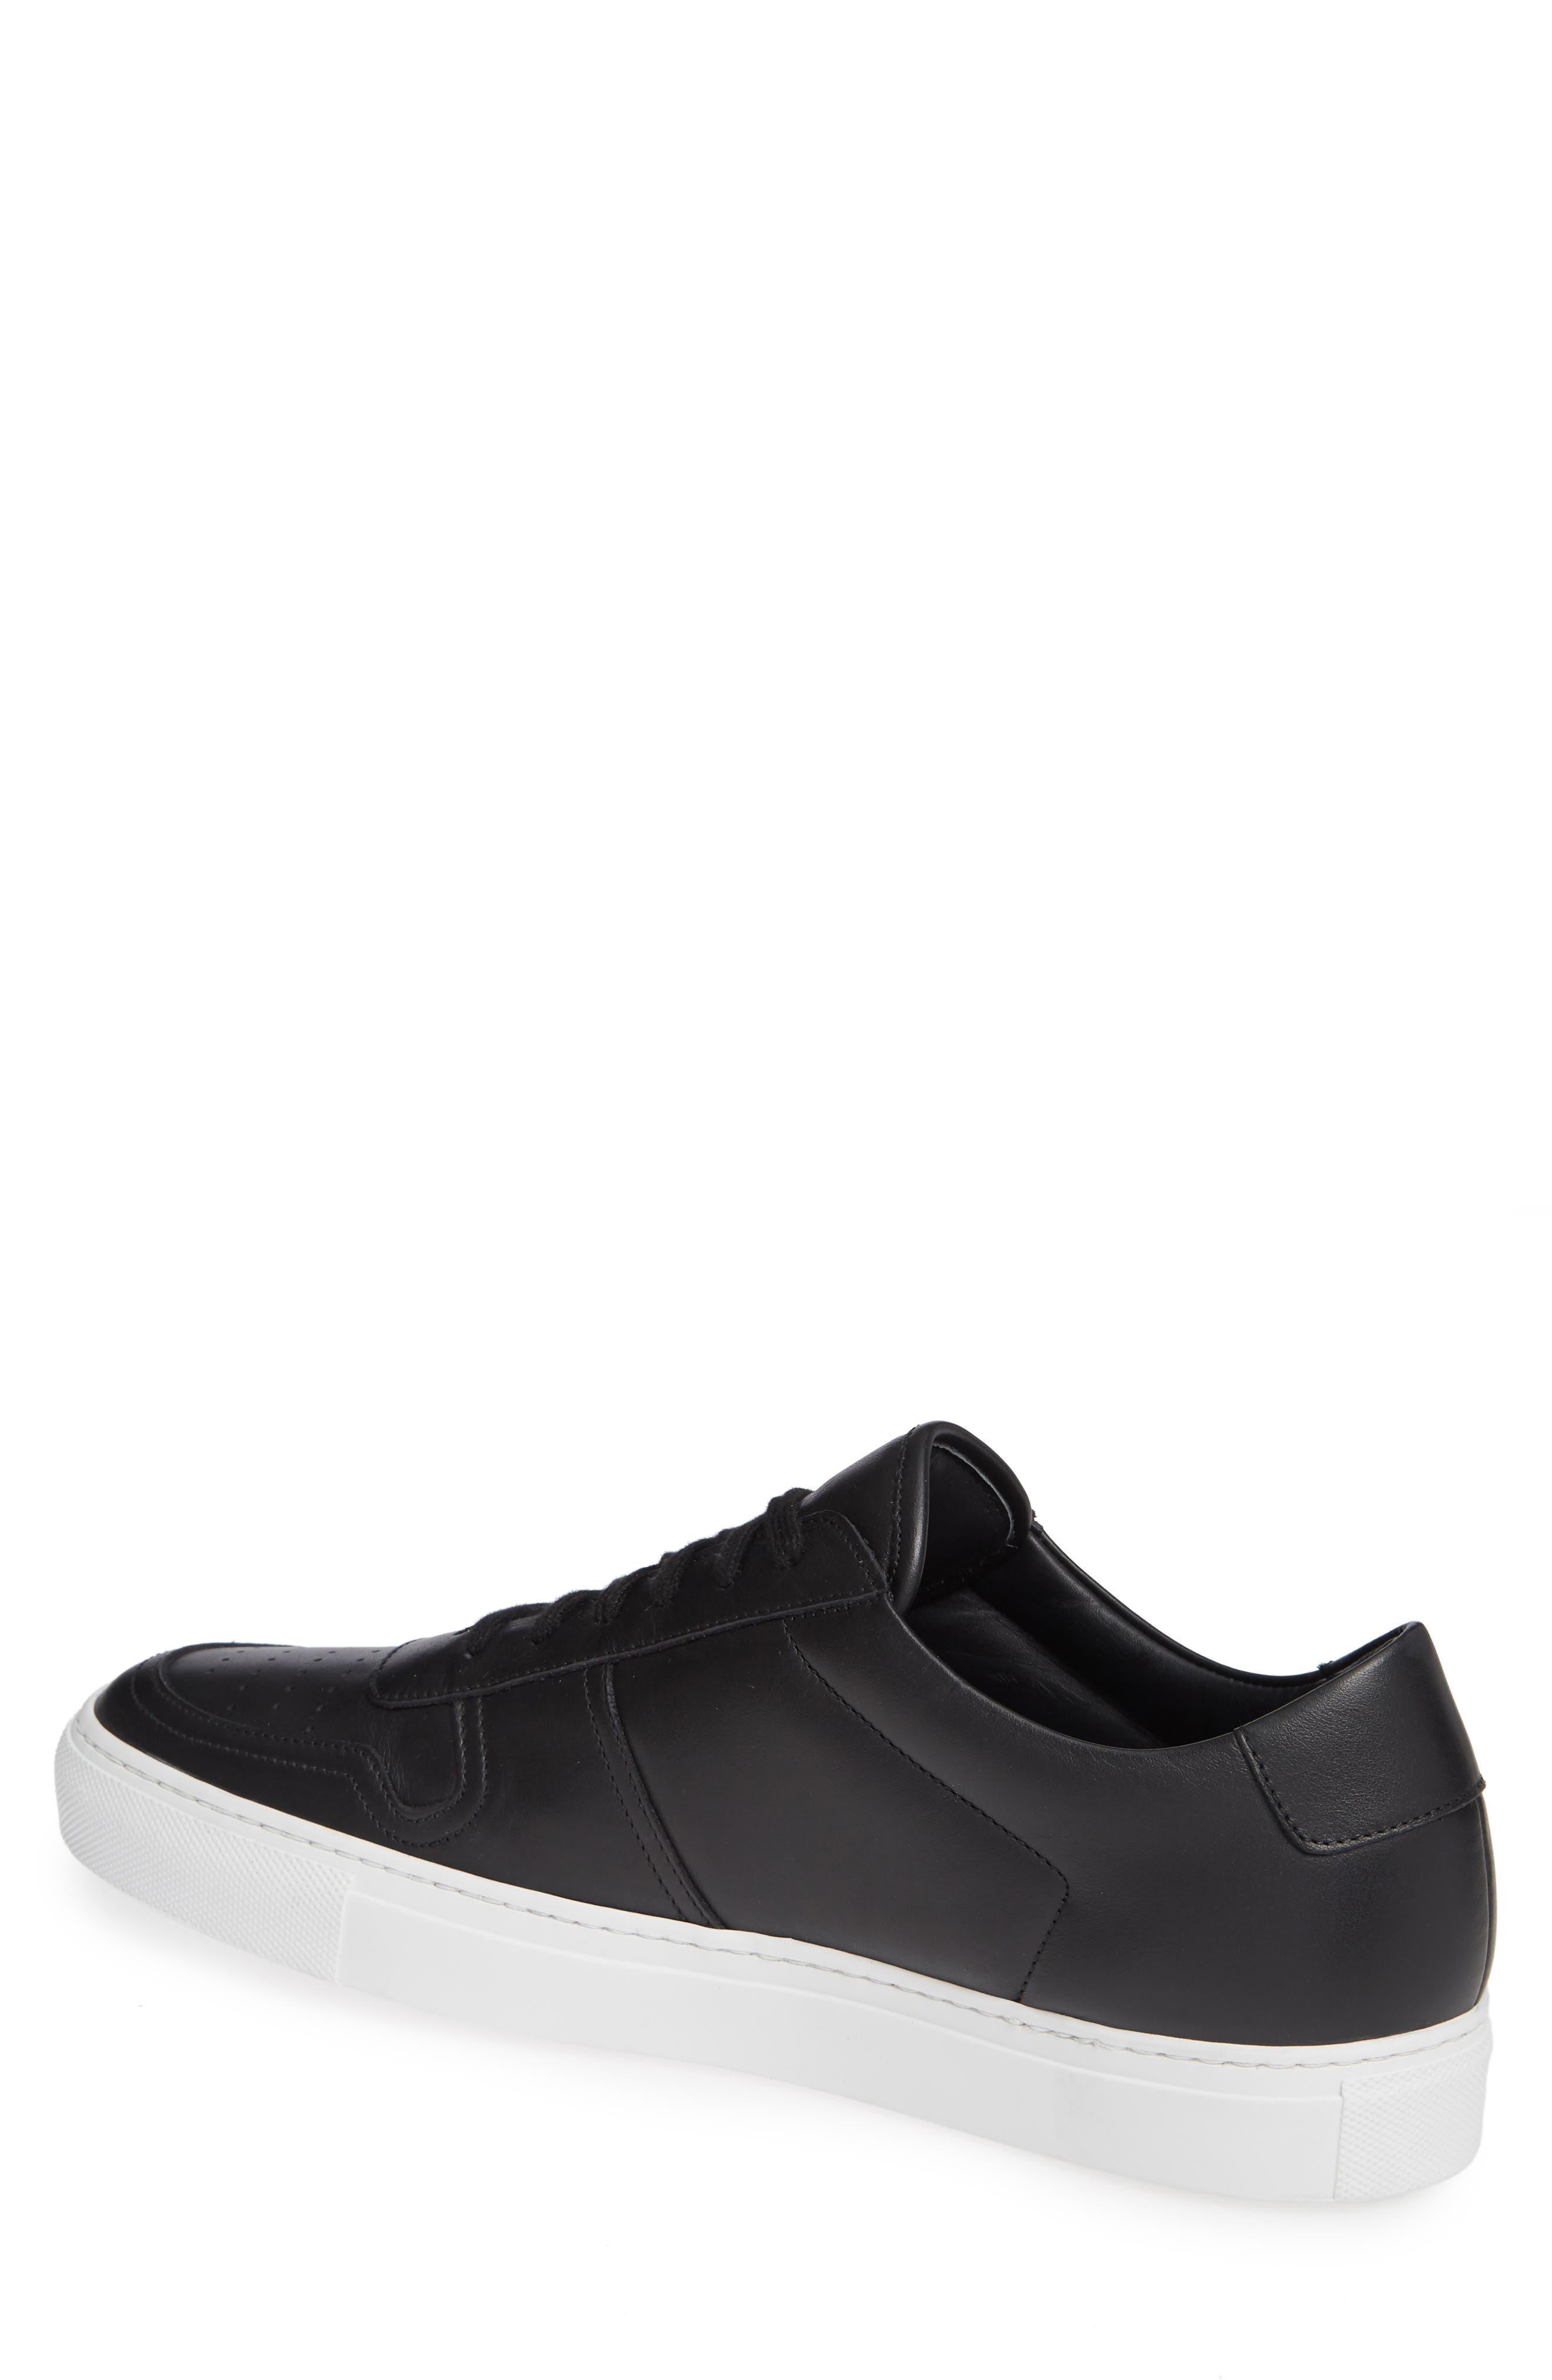 Bball Low Top Sneaker,                             Alternate thumbnail 2, color,                             BLACK